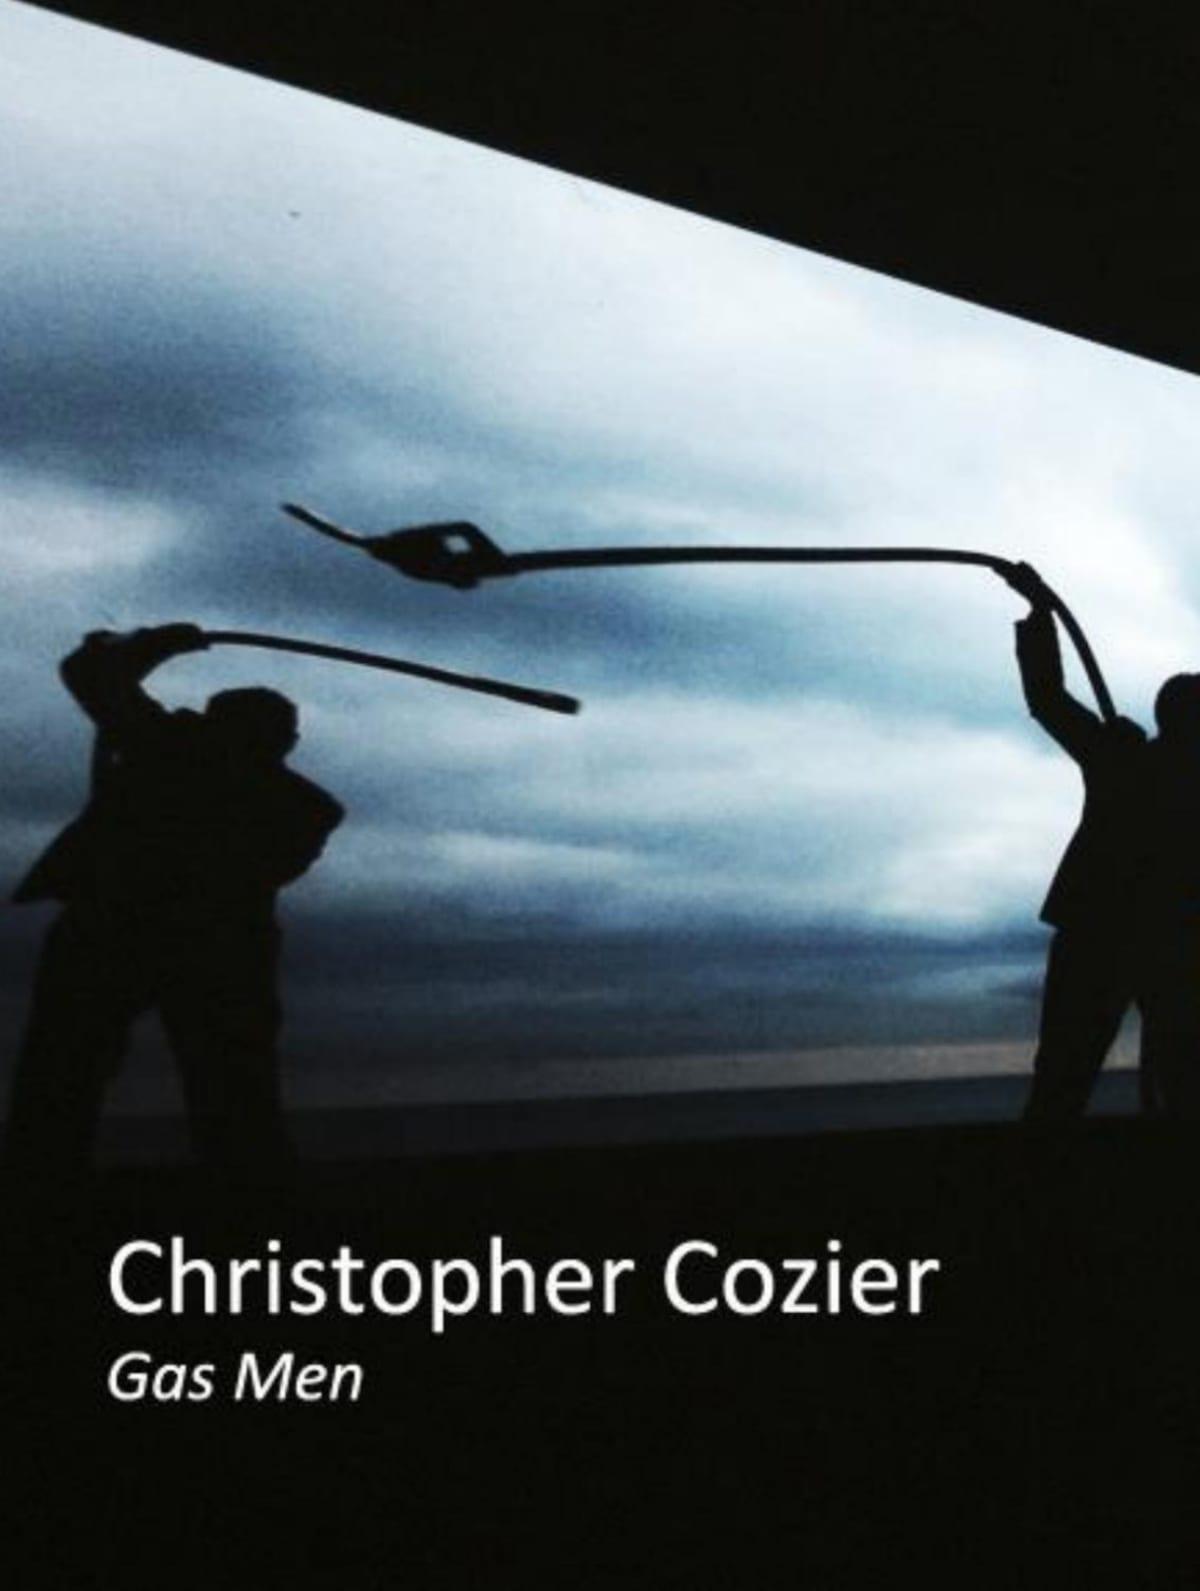 Christopher Cozier: Gas Men